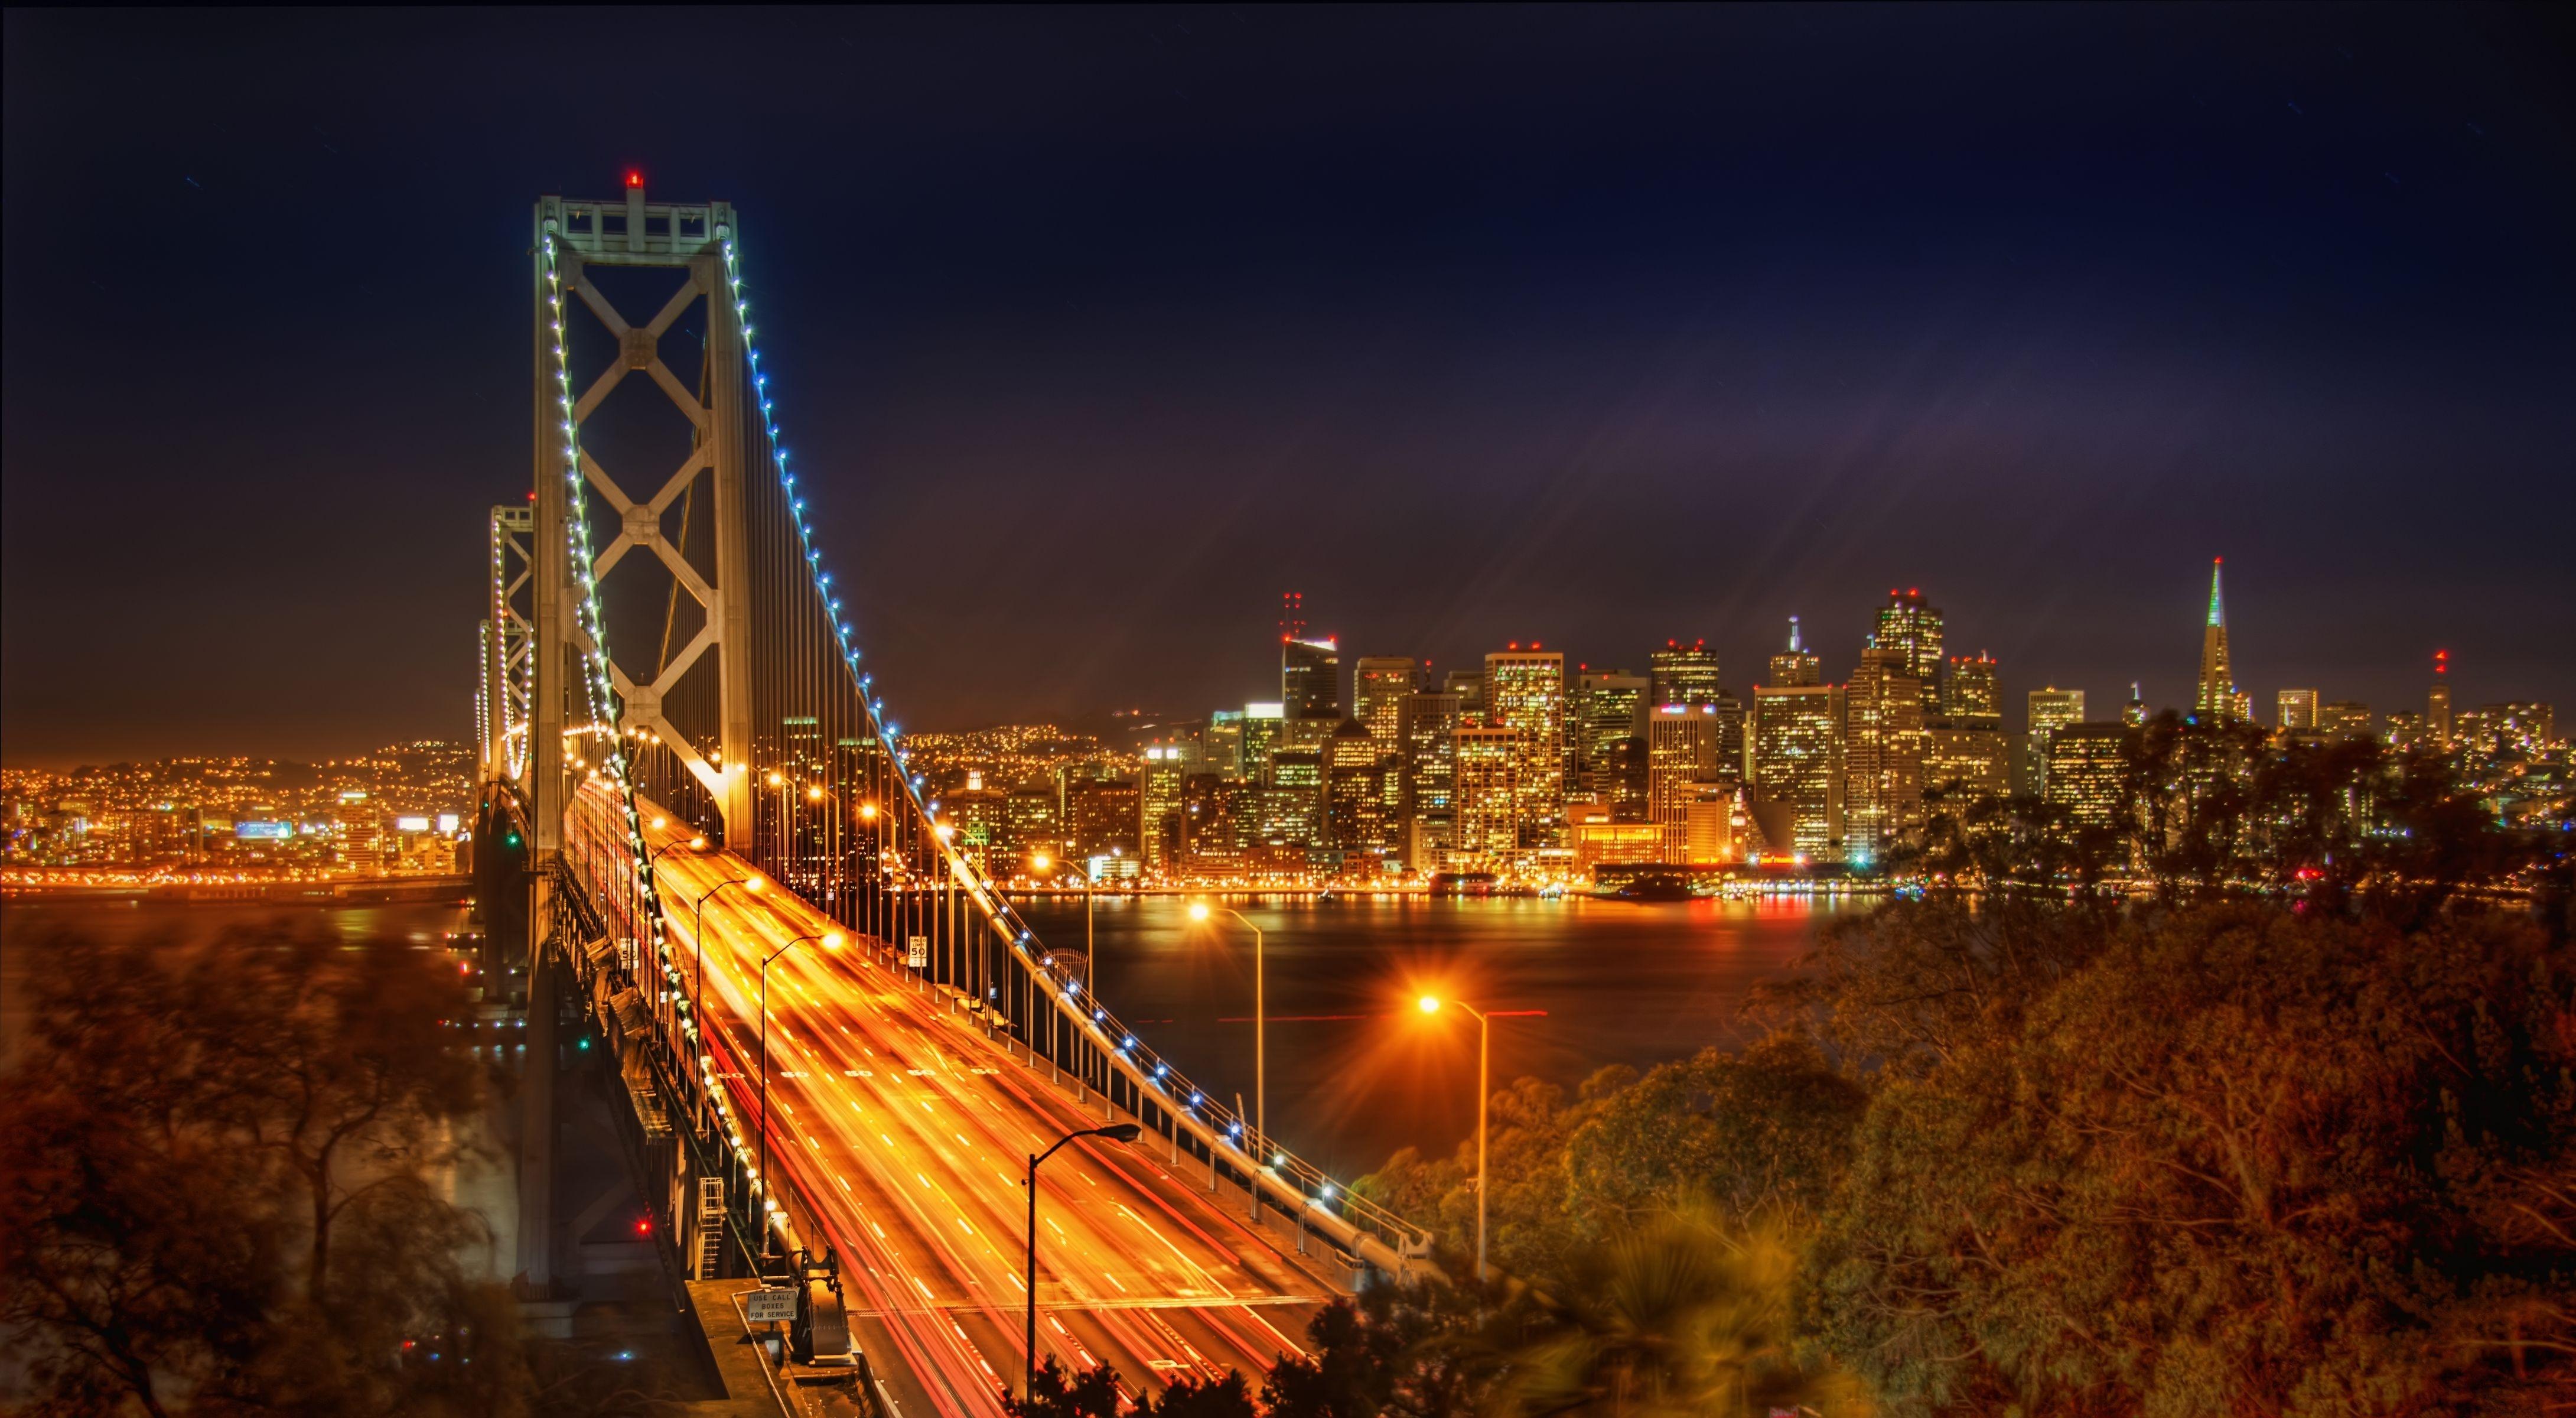 Evening Crossing, Bay Bridge, San Francisco, California  № 3720977  скачать